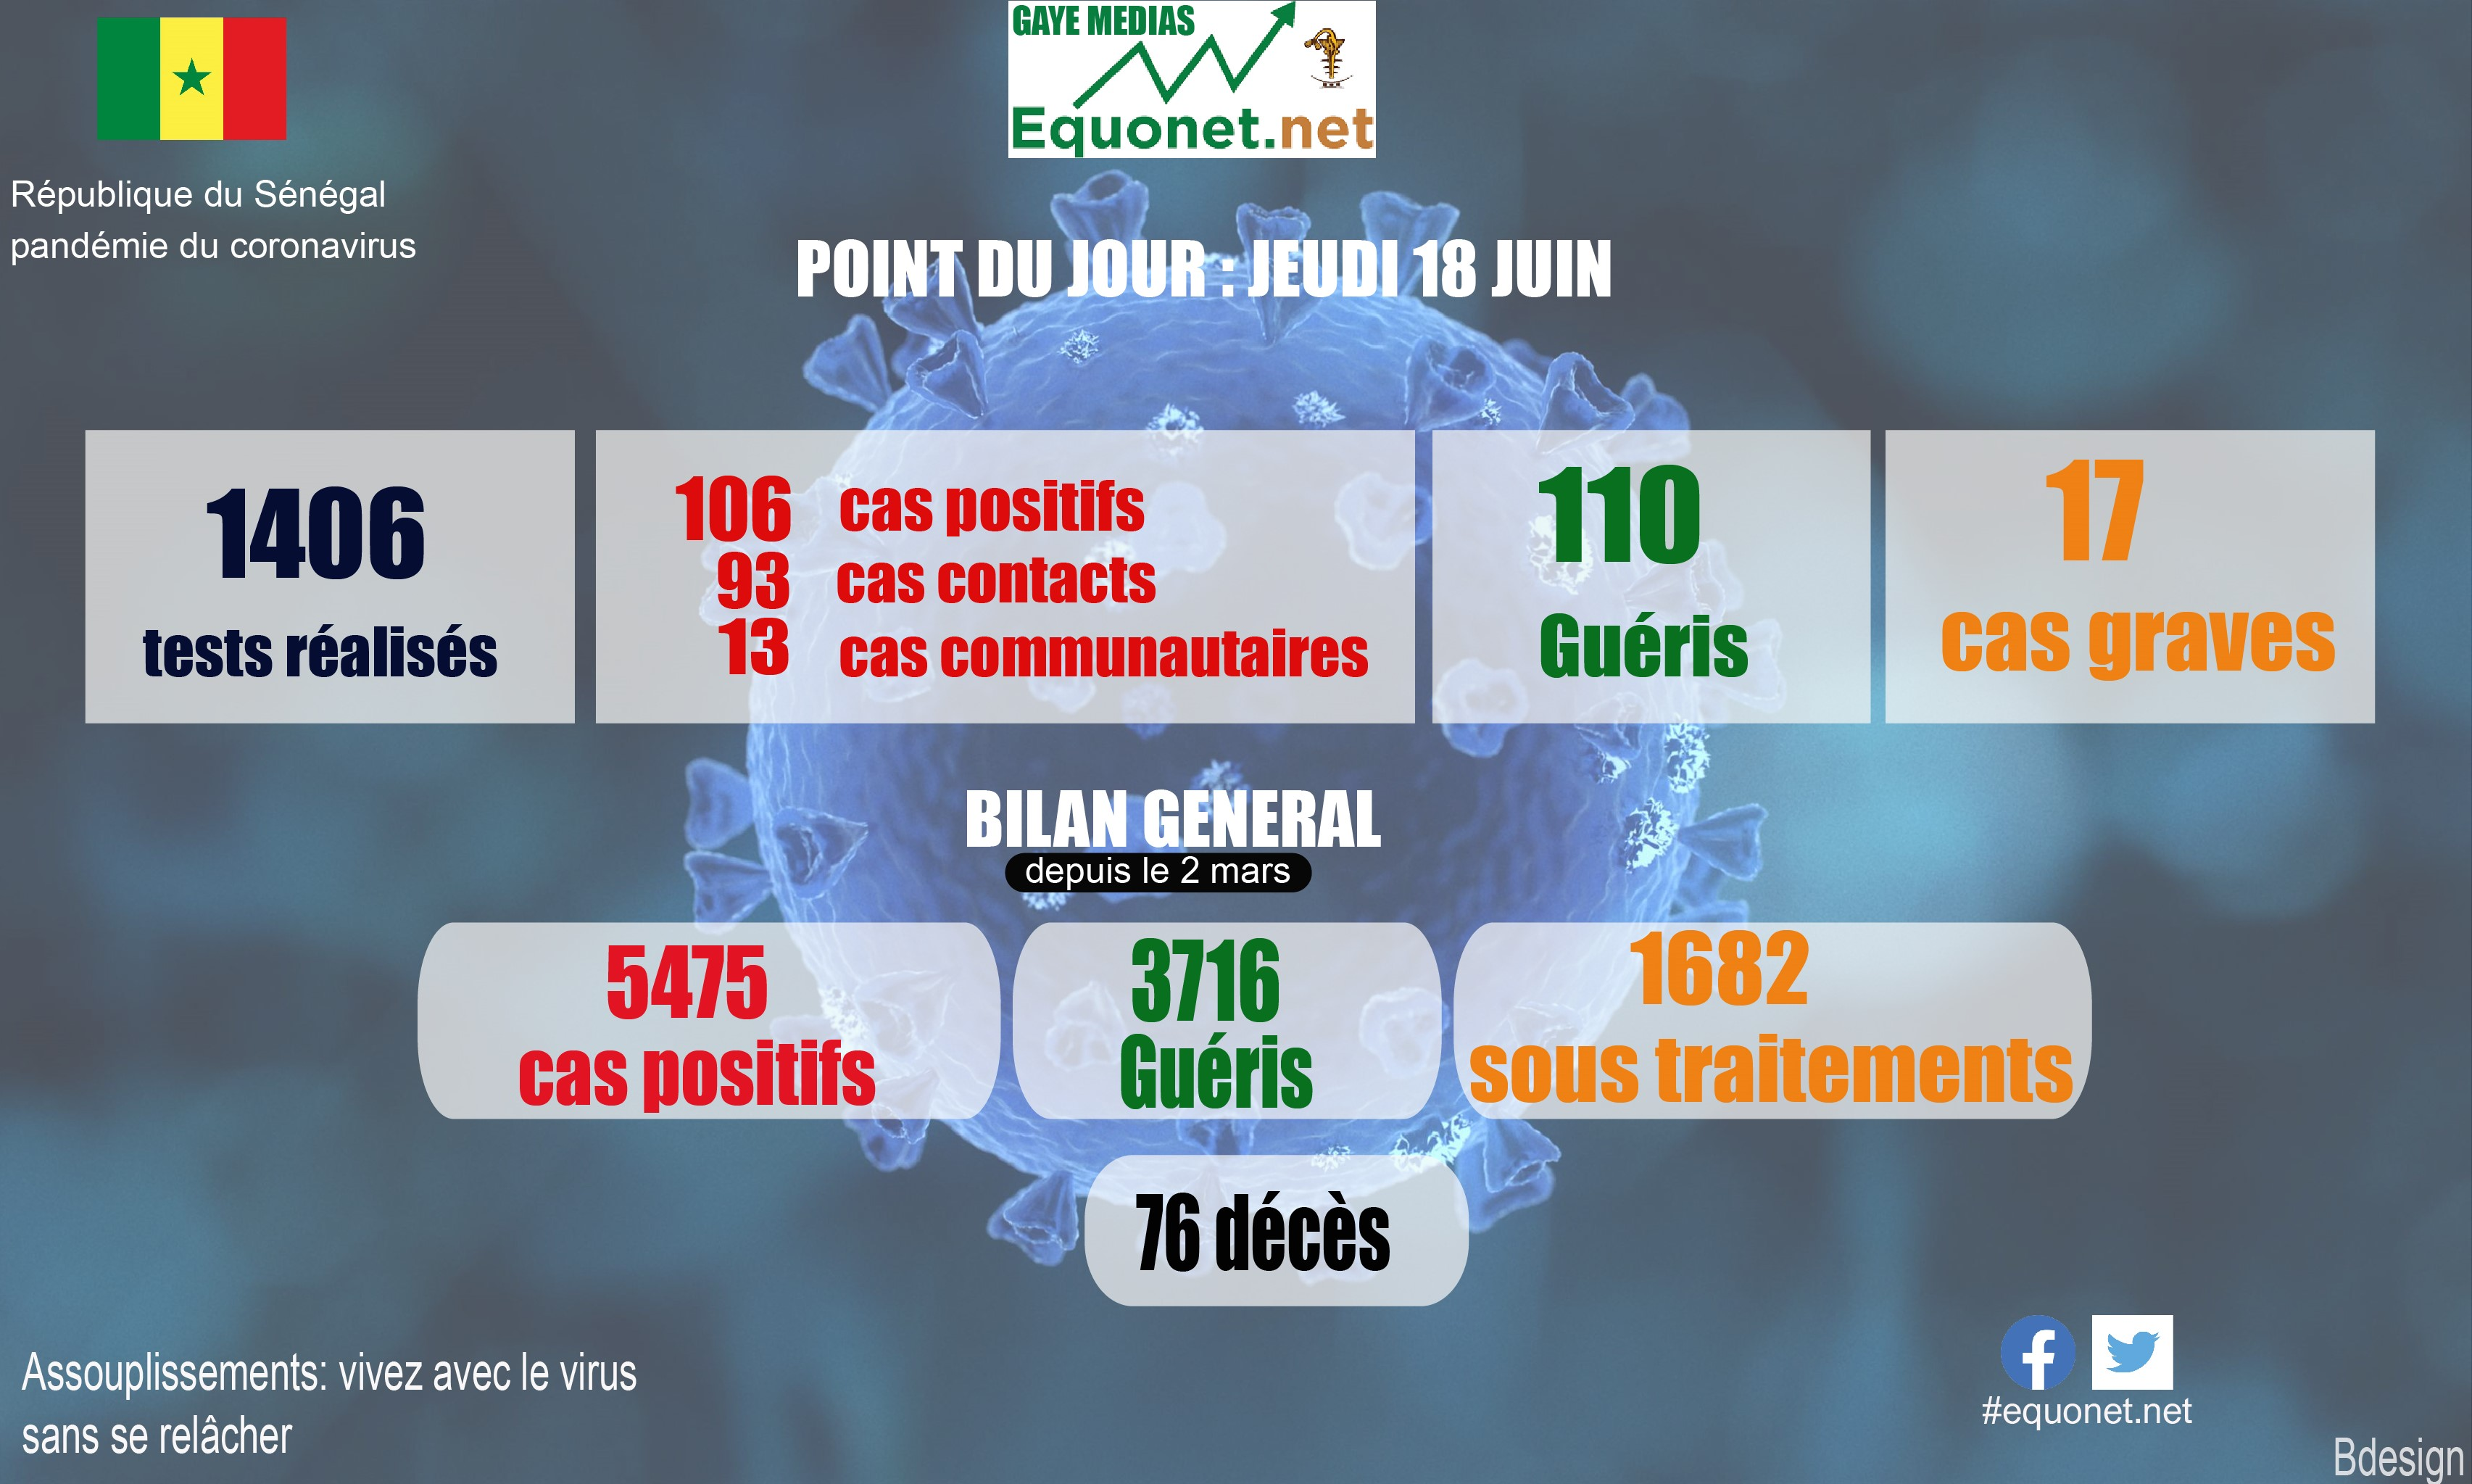 pandémie du coronavirus-covid-19 au sénégal : point de situation du jeudi 18 juin 2020